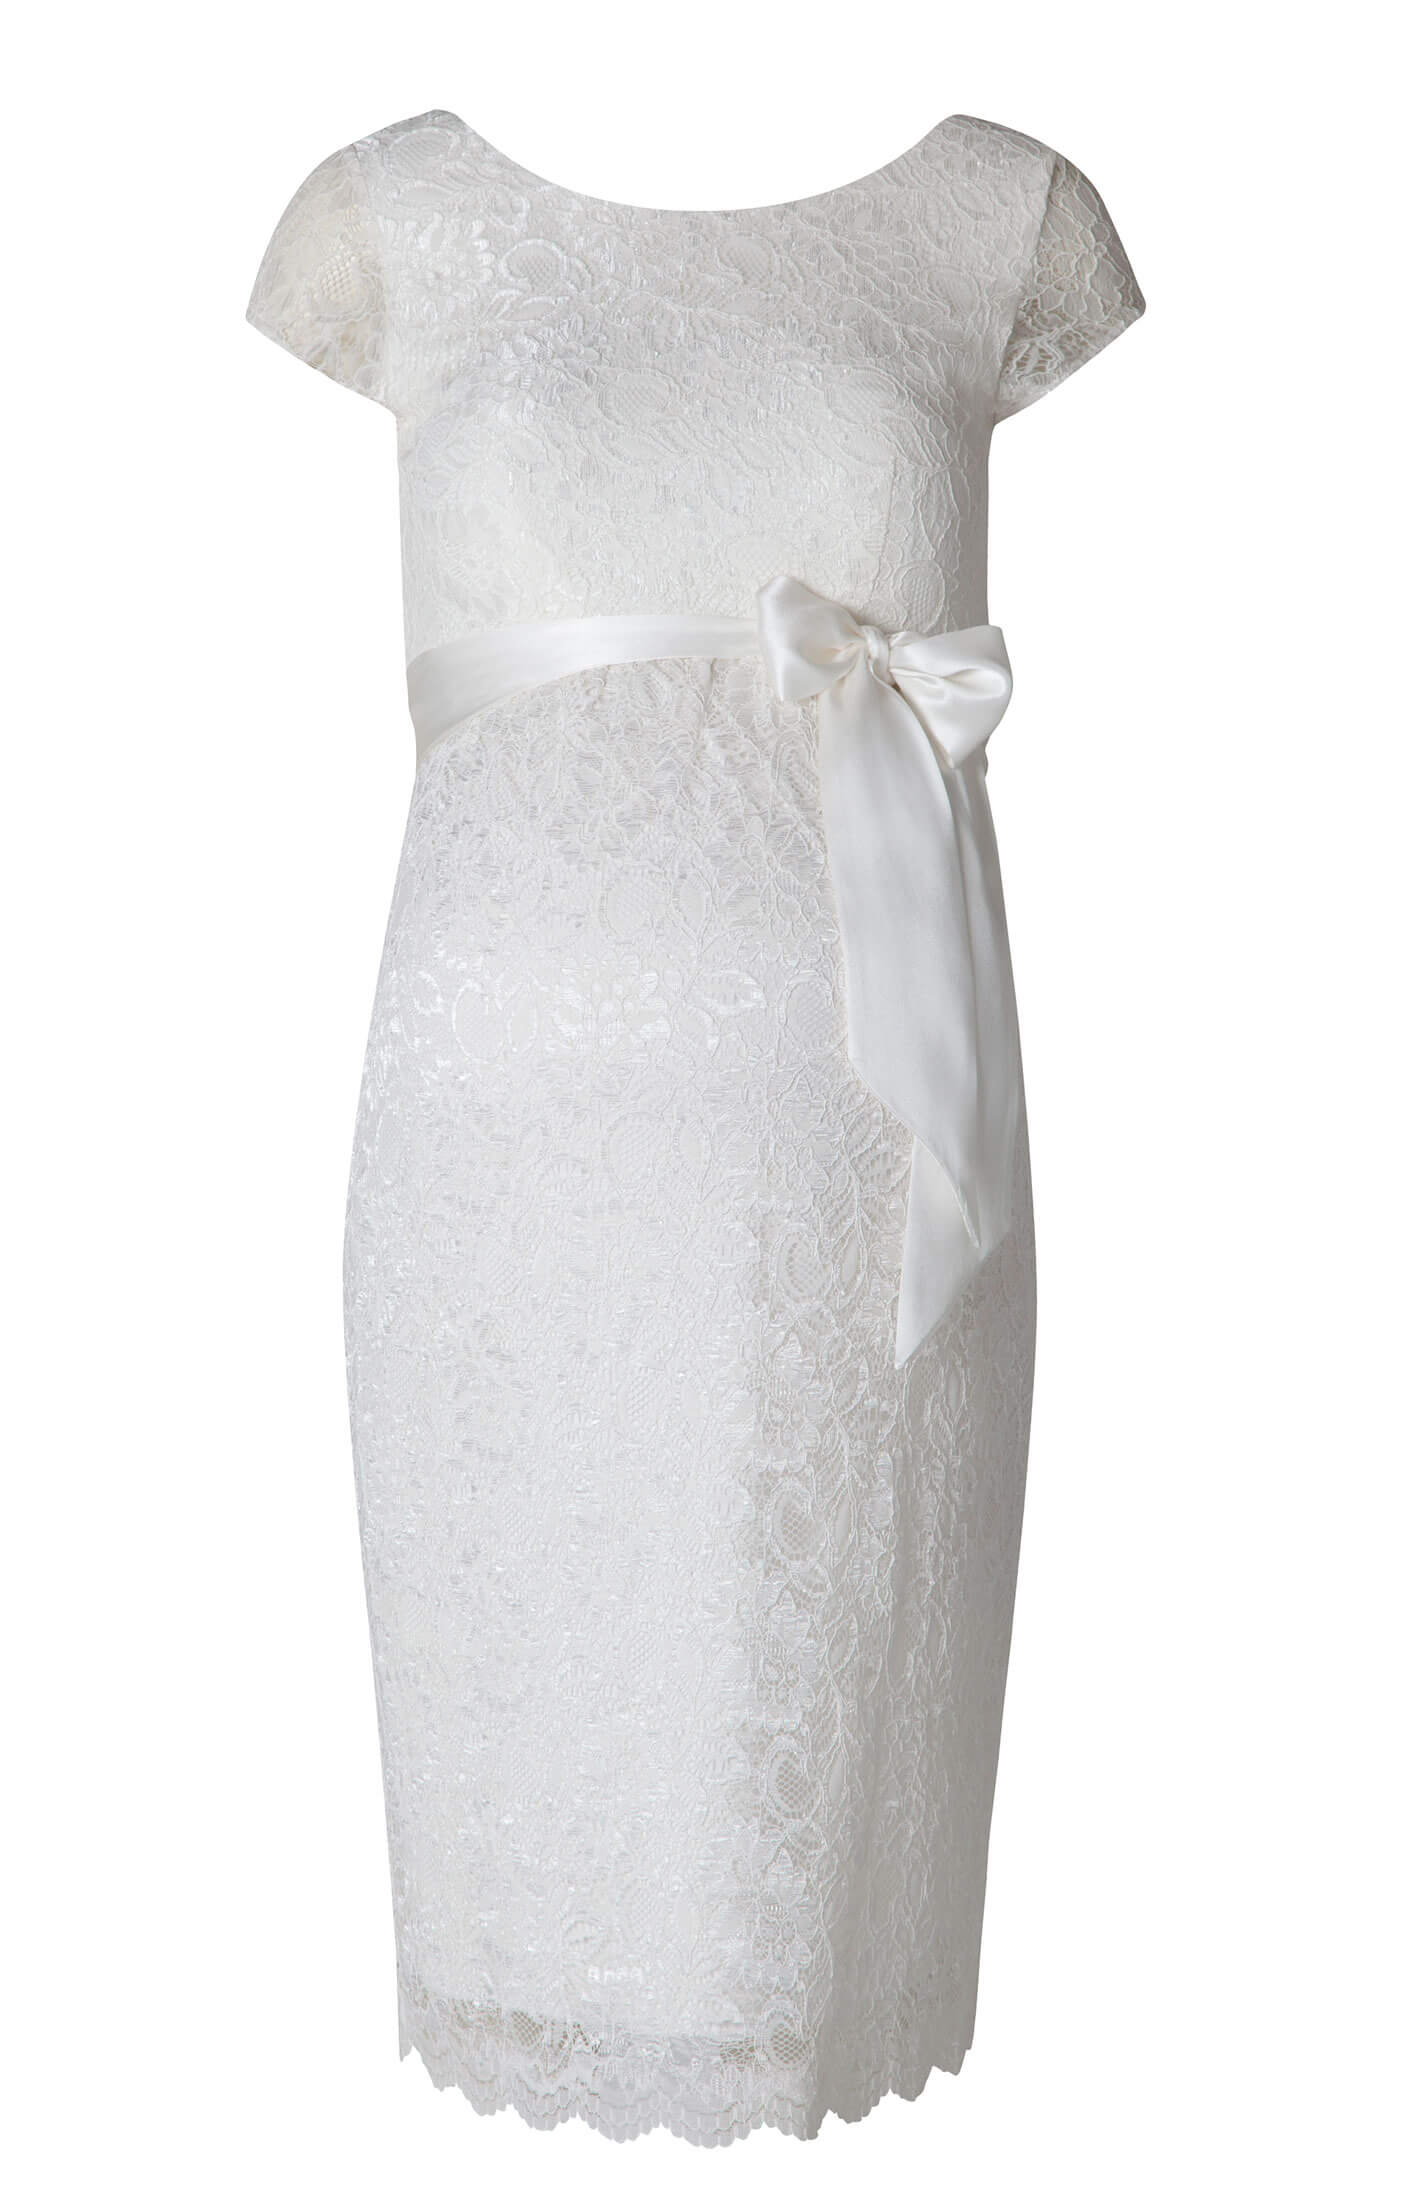 5f8b809b4d Emma Maternity Shift Dress Ivory - Maternity Wedding Dresses ...